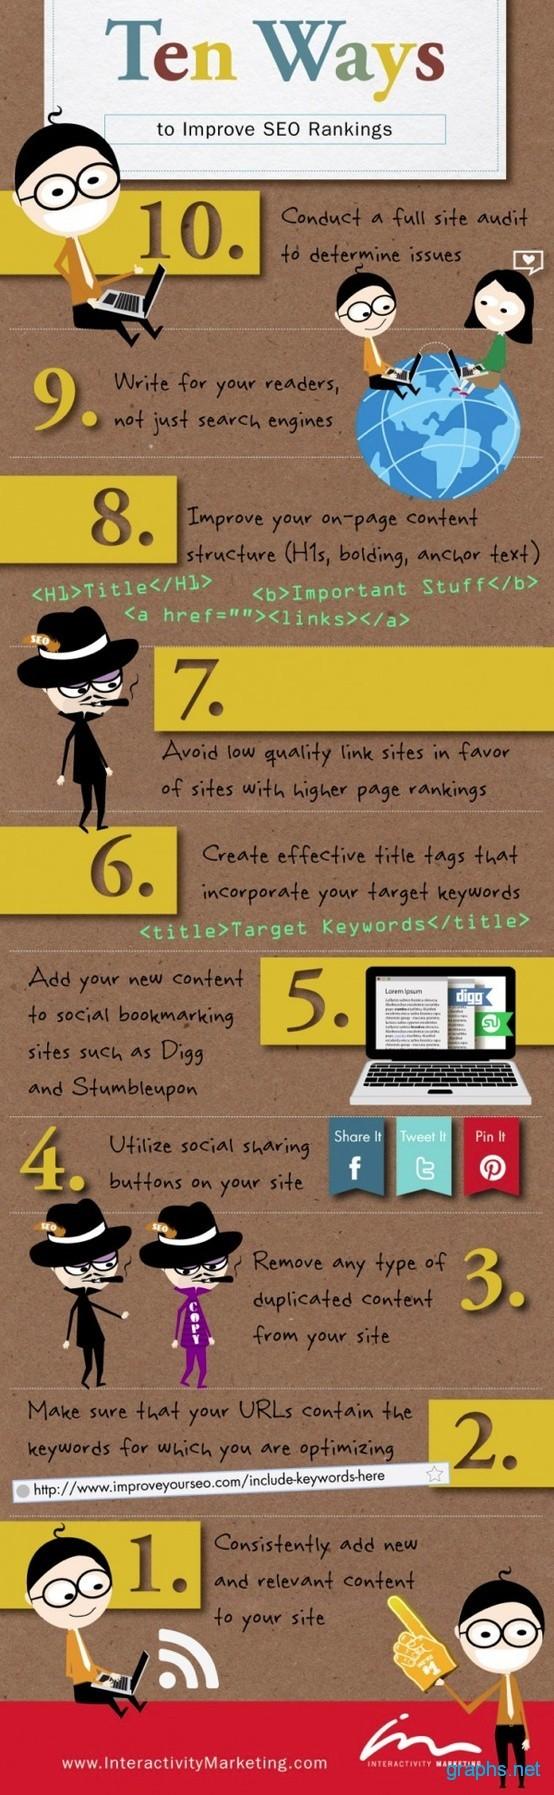 10 Ways To Improve SEO Rankings